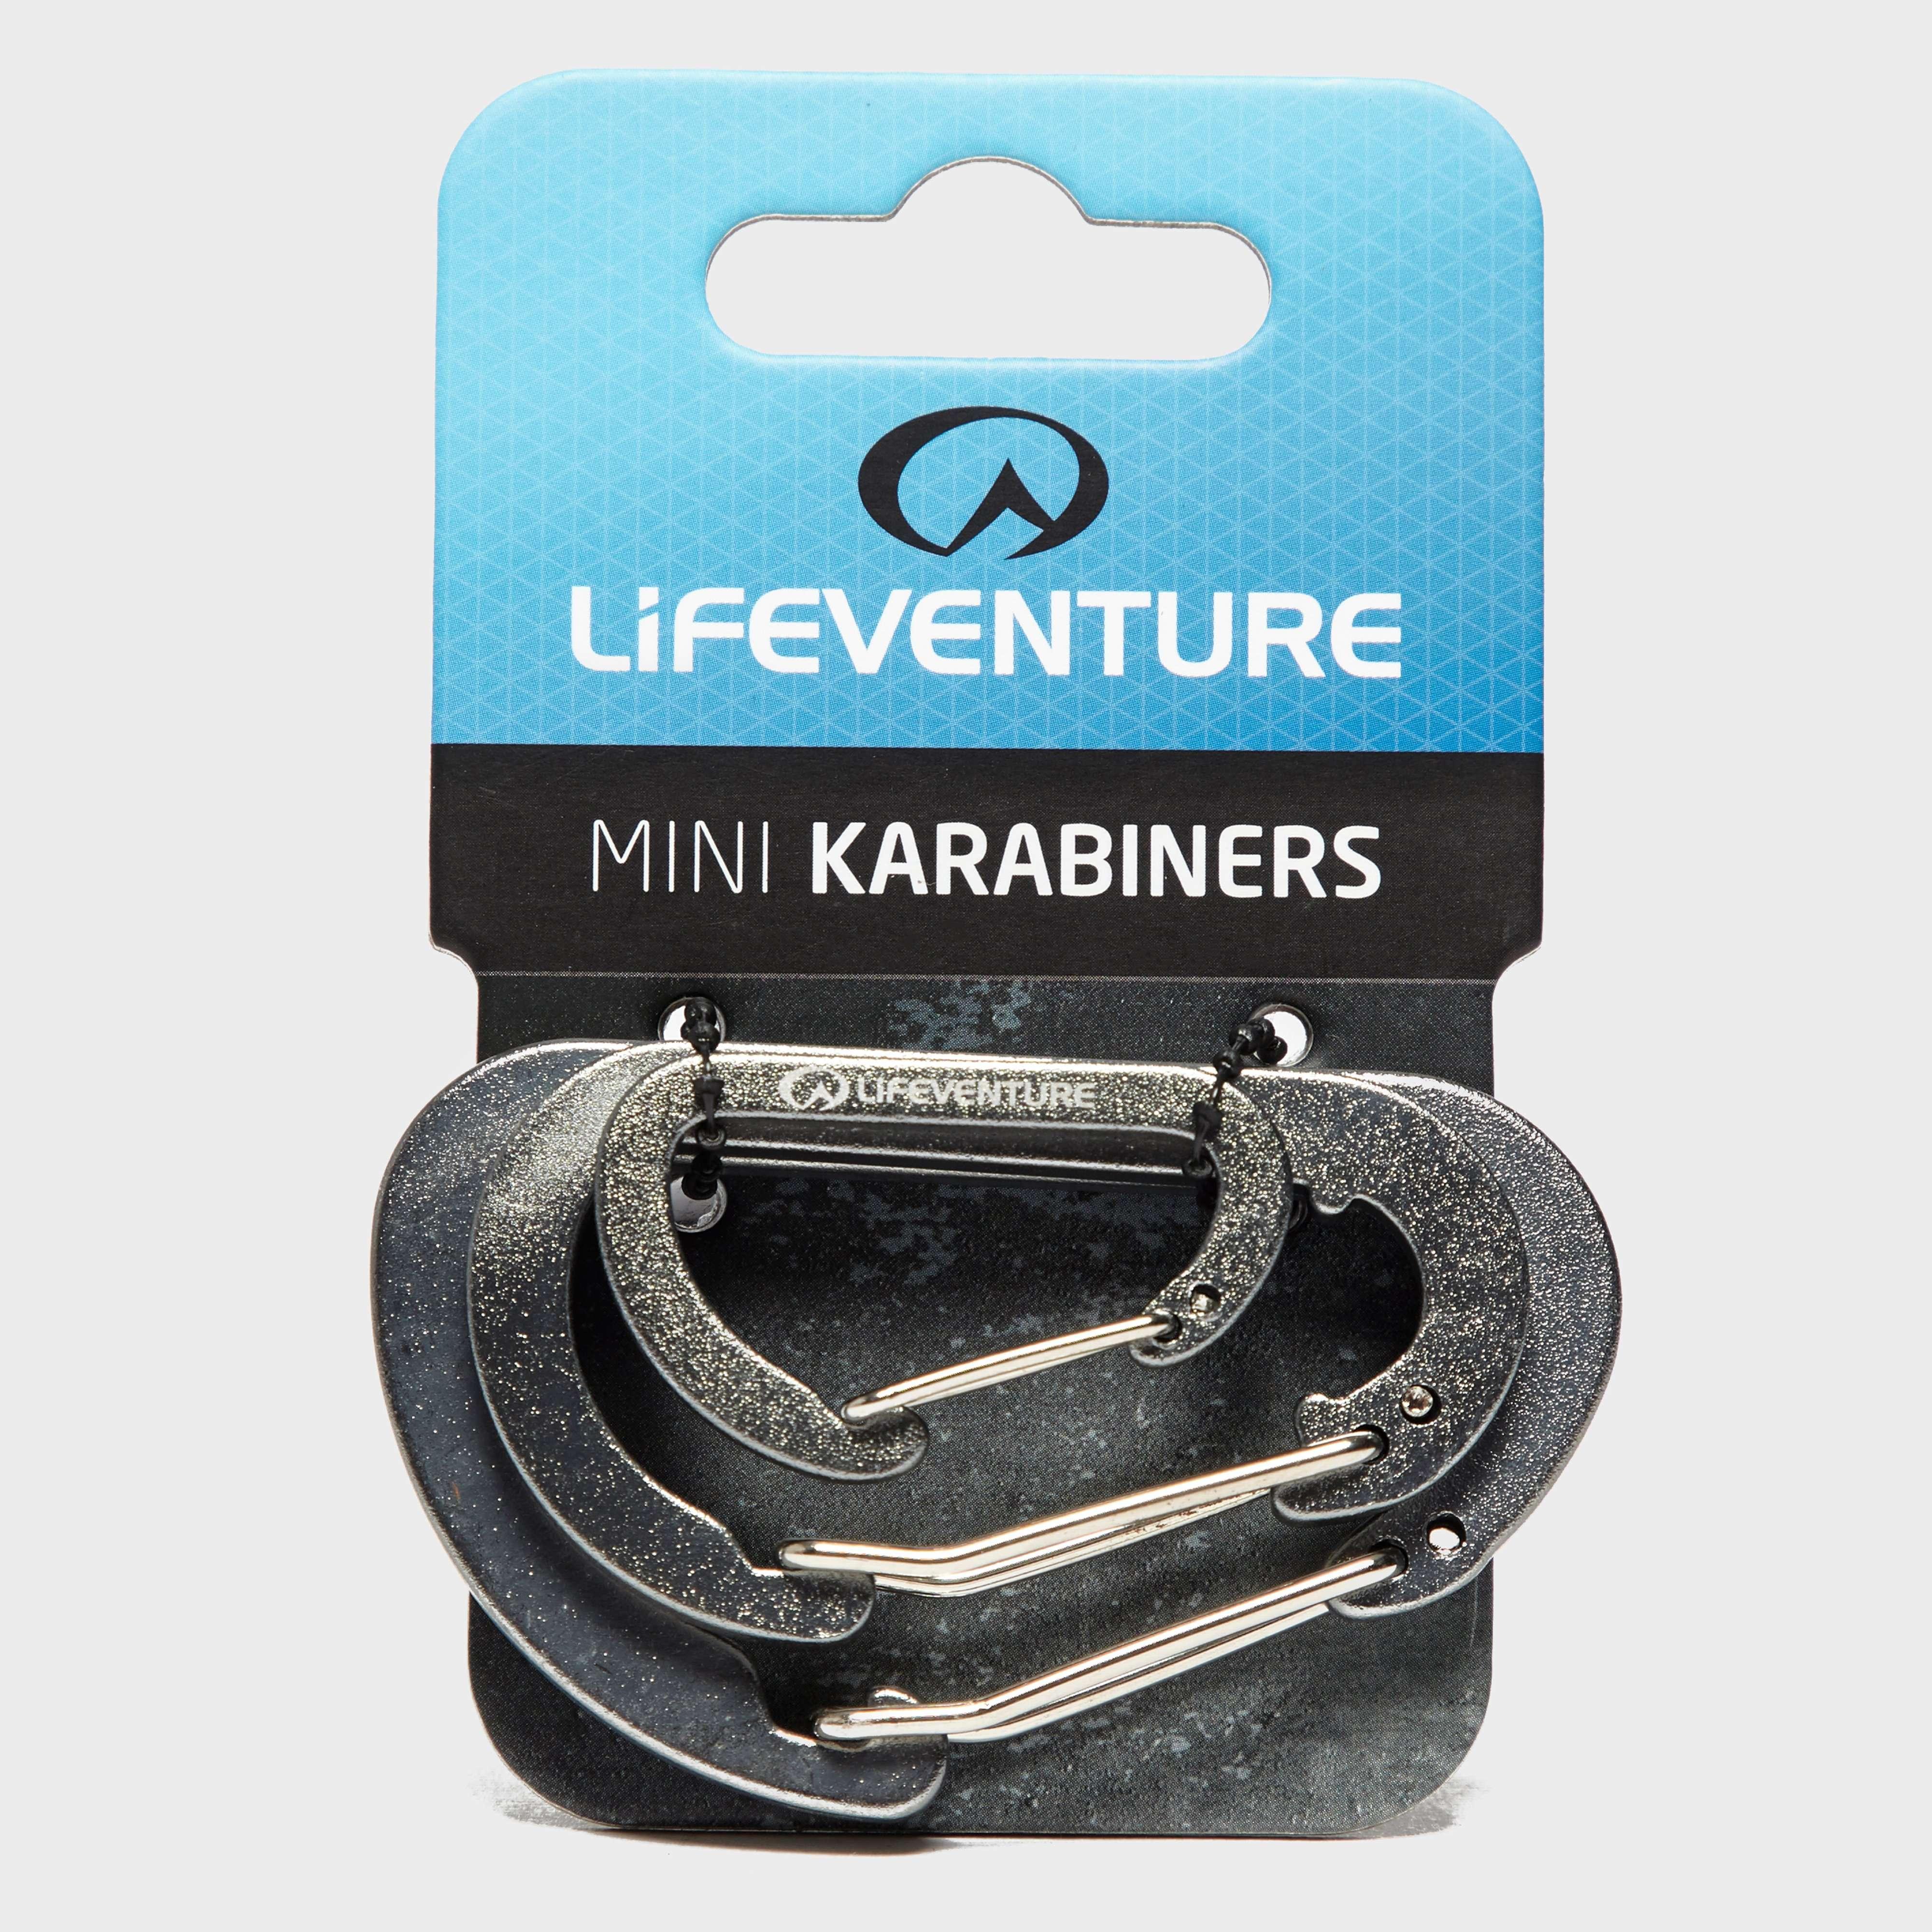 LIFEVENTURE Carabiner (3 Pack)